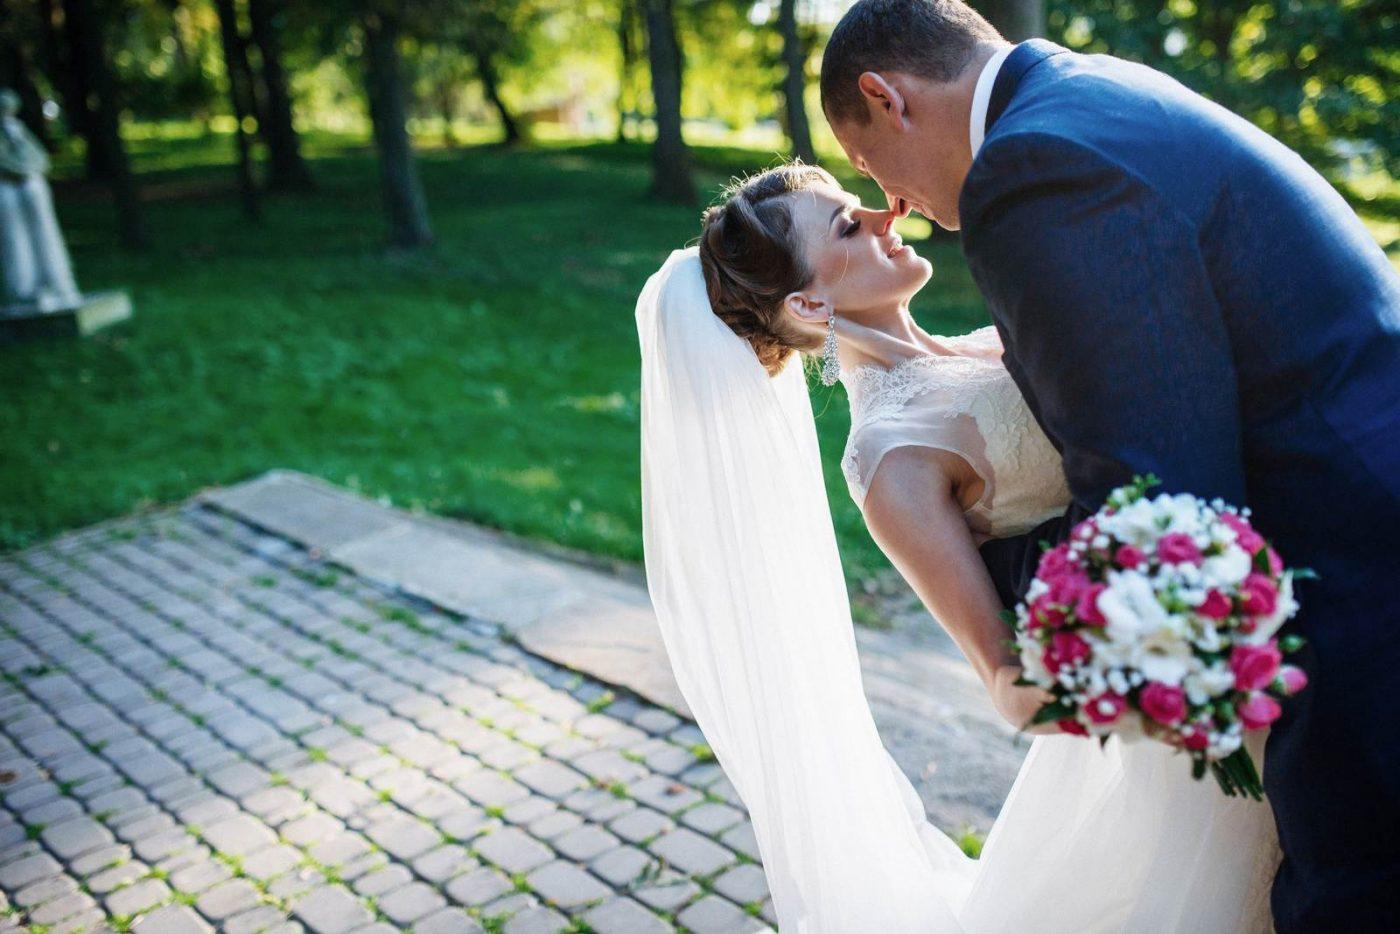 Boise wedding videographers